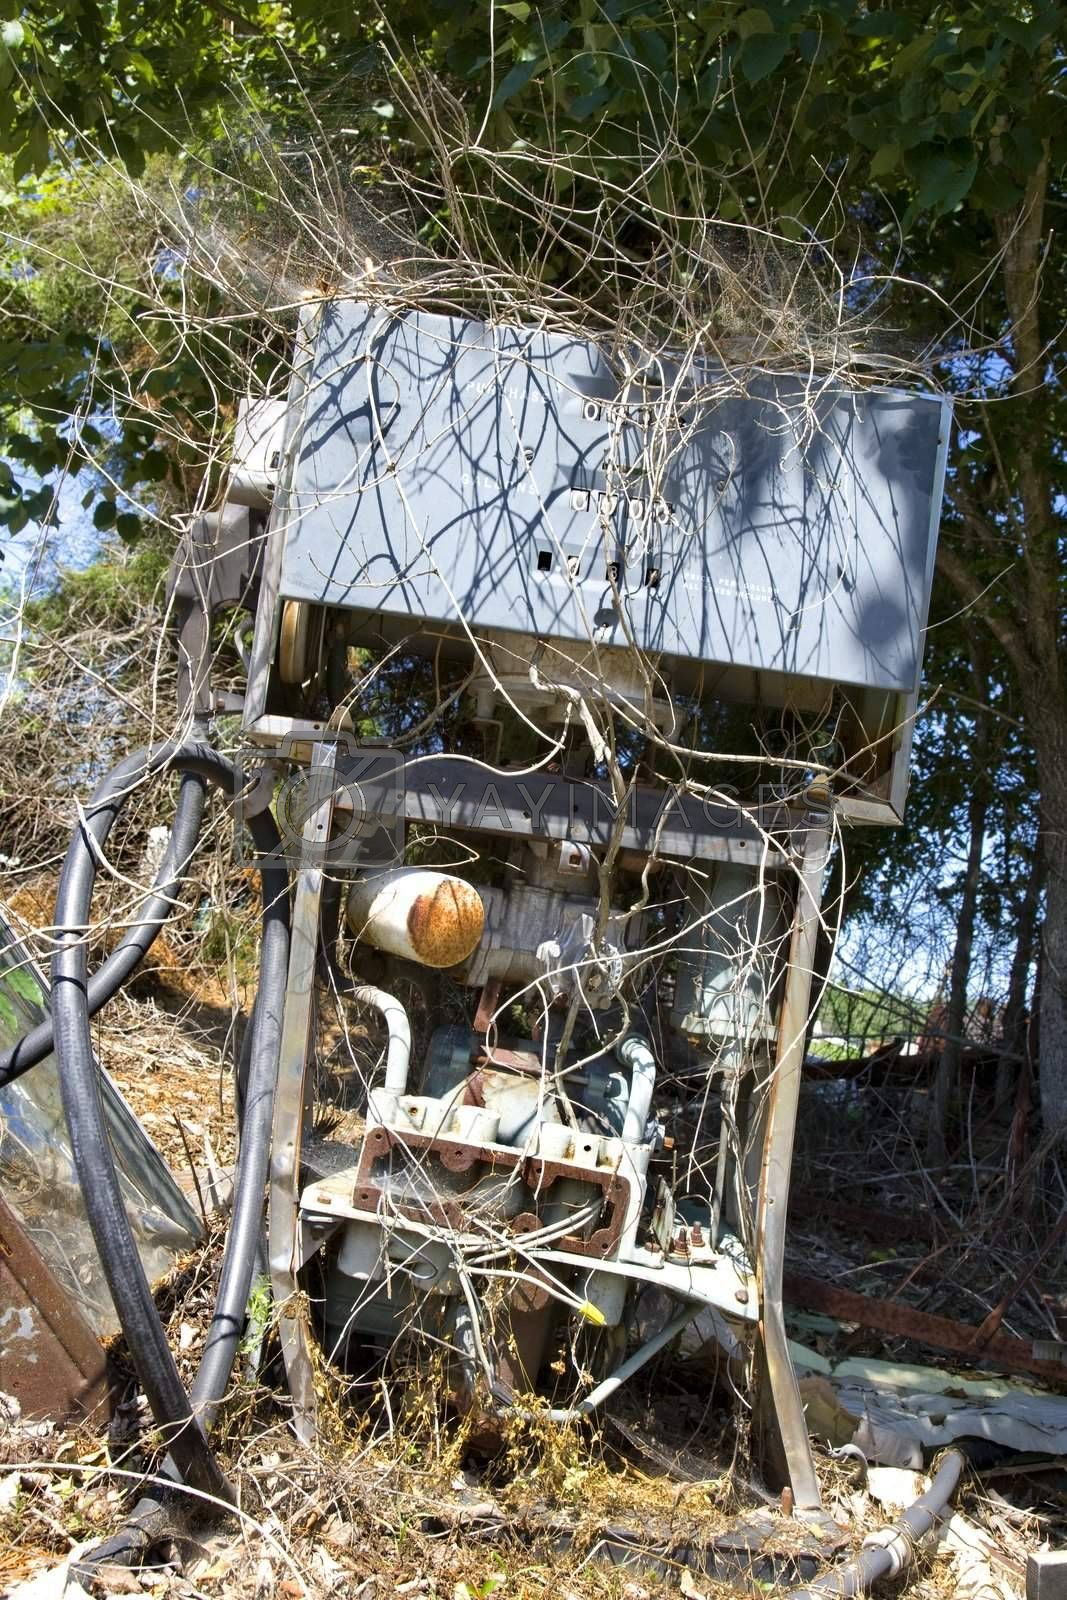 Old broken gasoline pump covered with weeds.